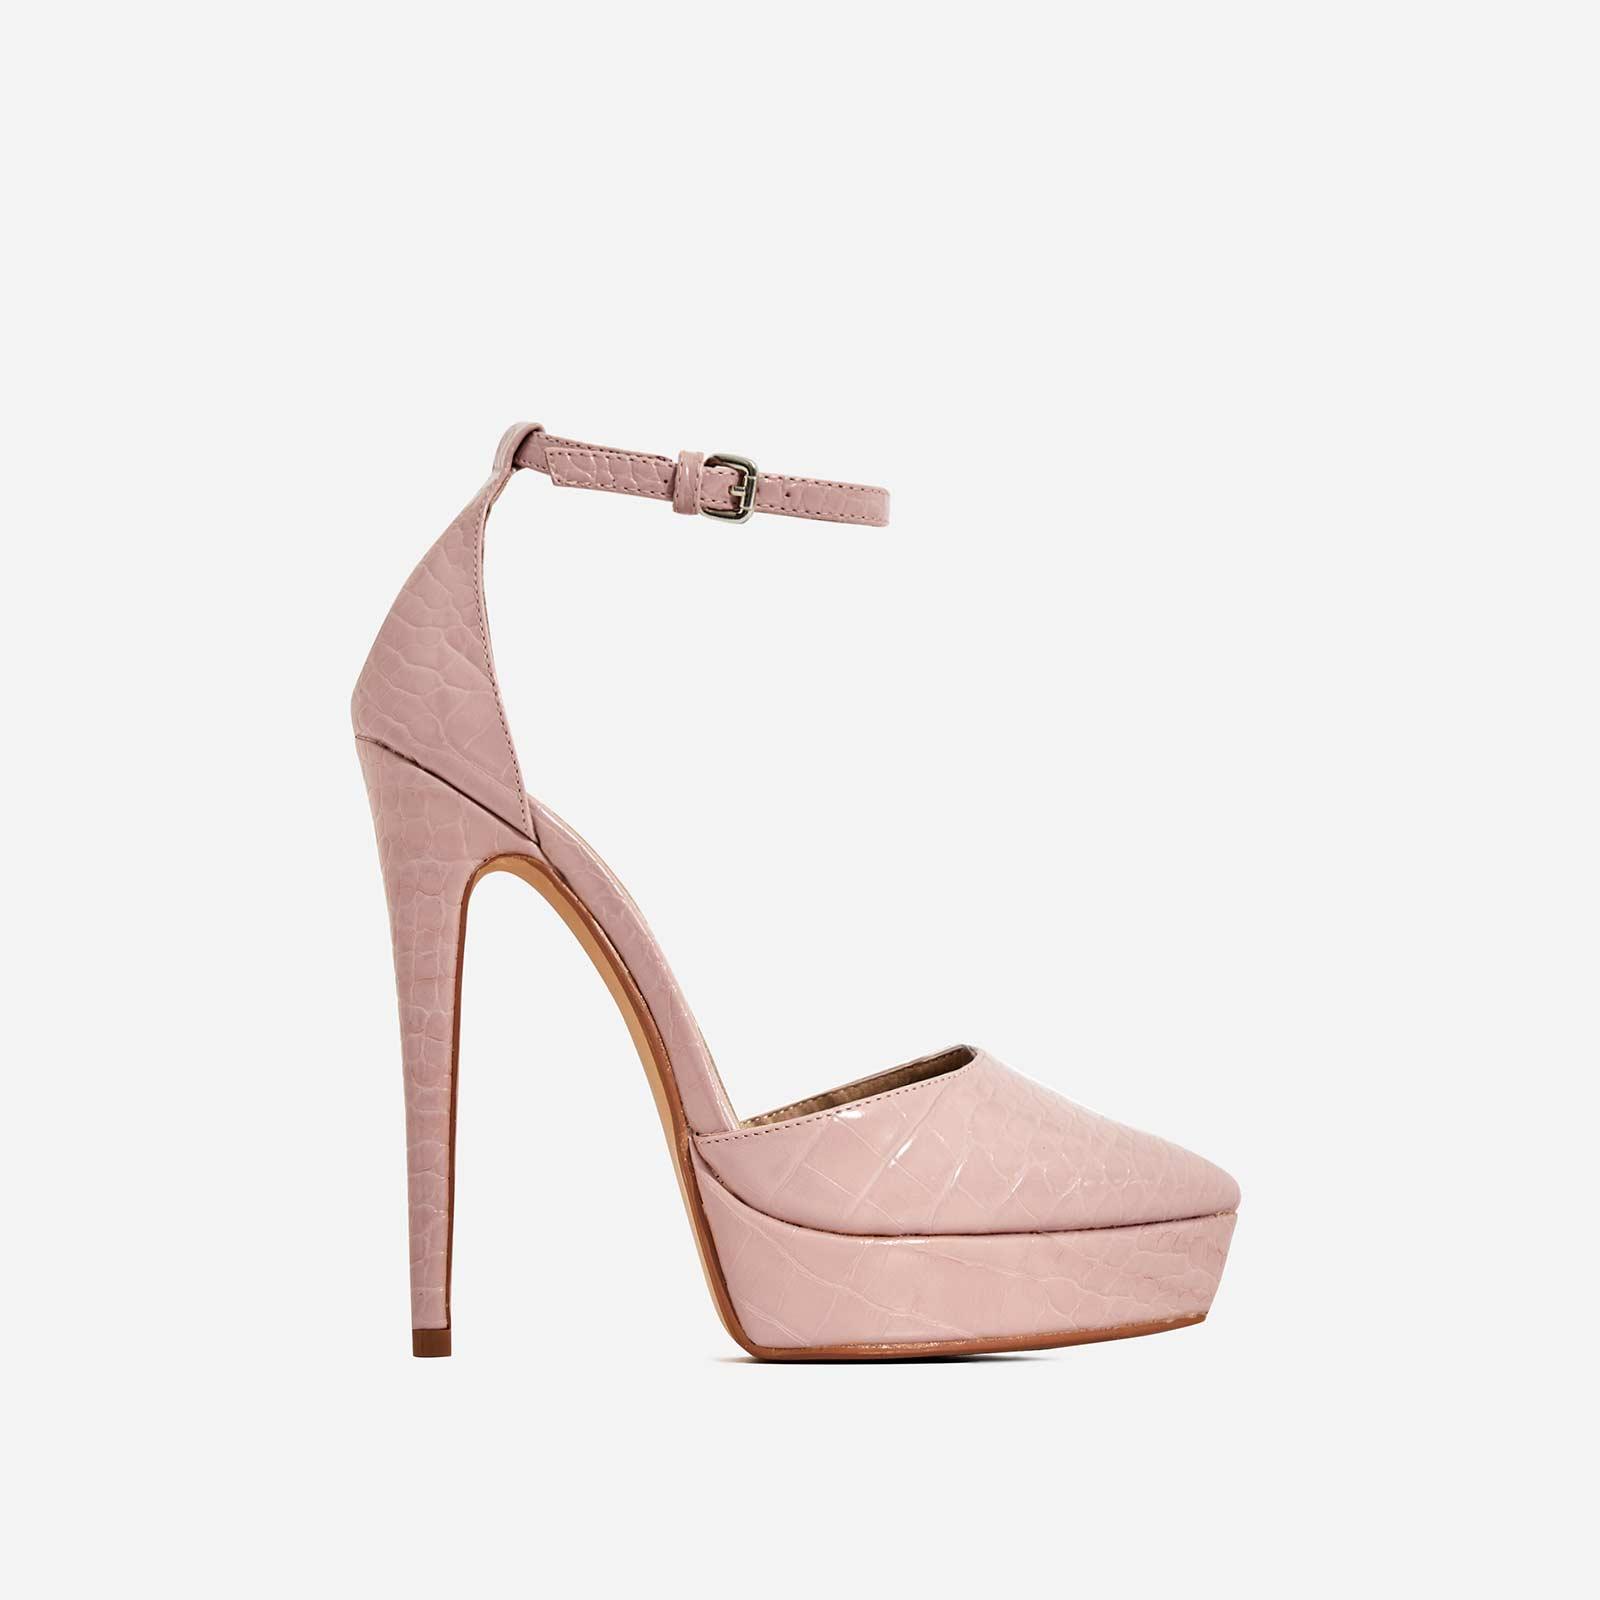 Pleasure Platform Pointed Toe Heel In Nude Croc Print Faux Leather